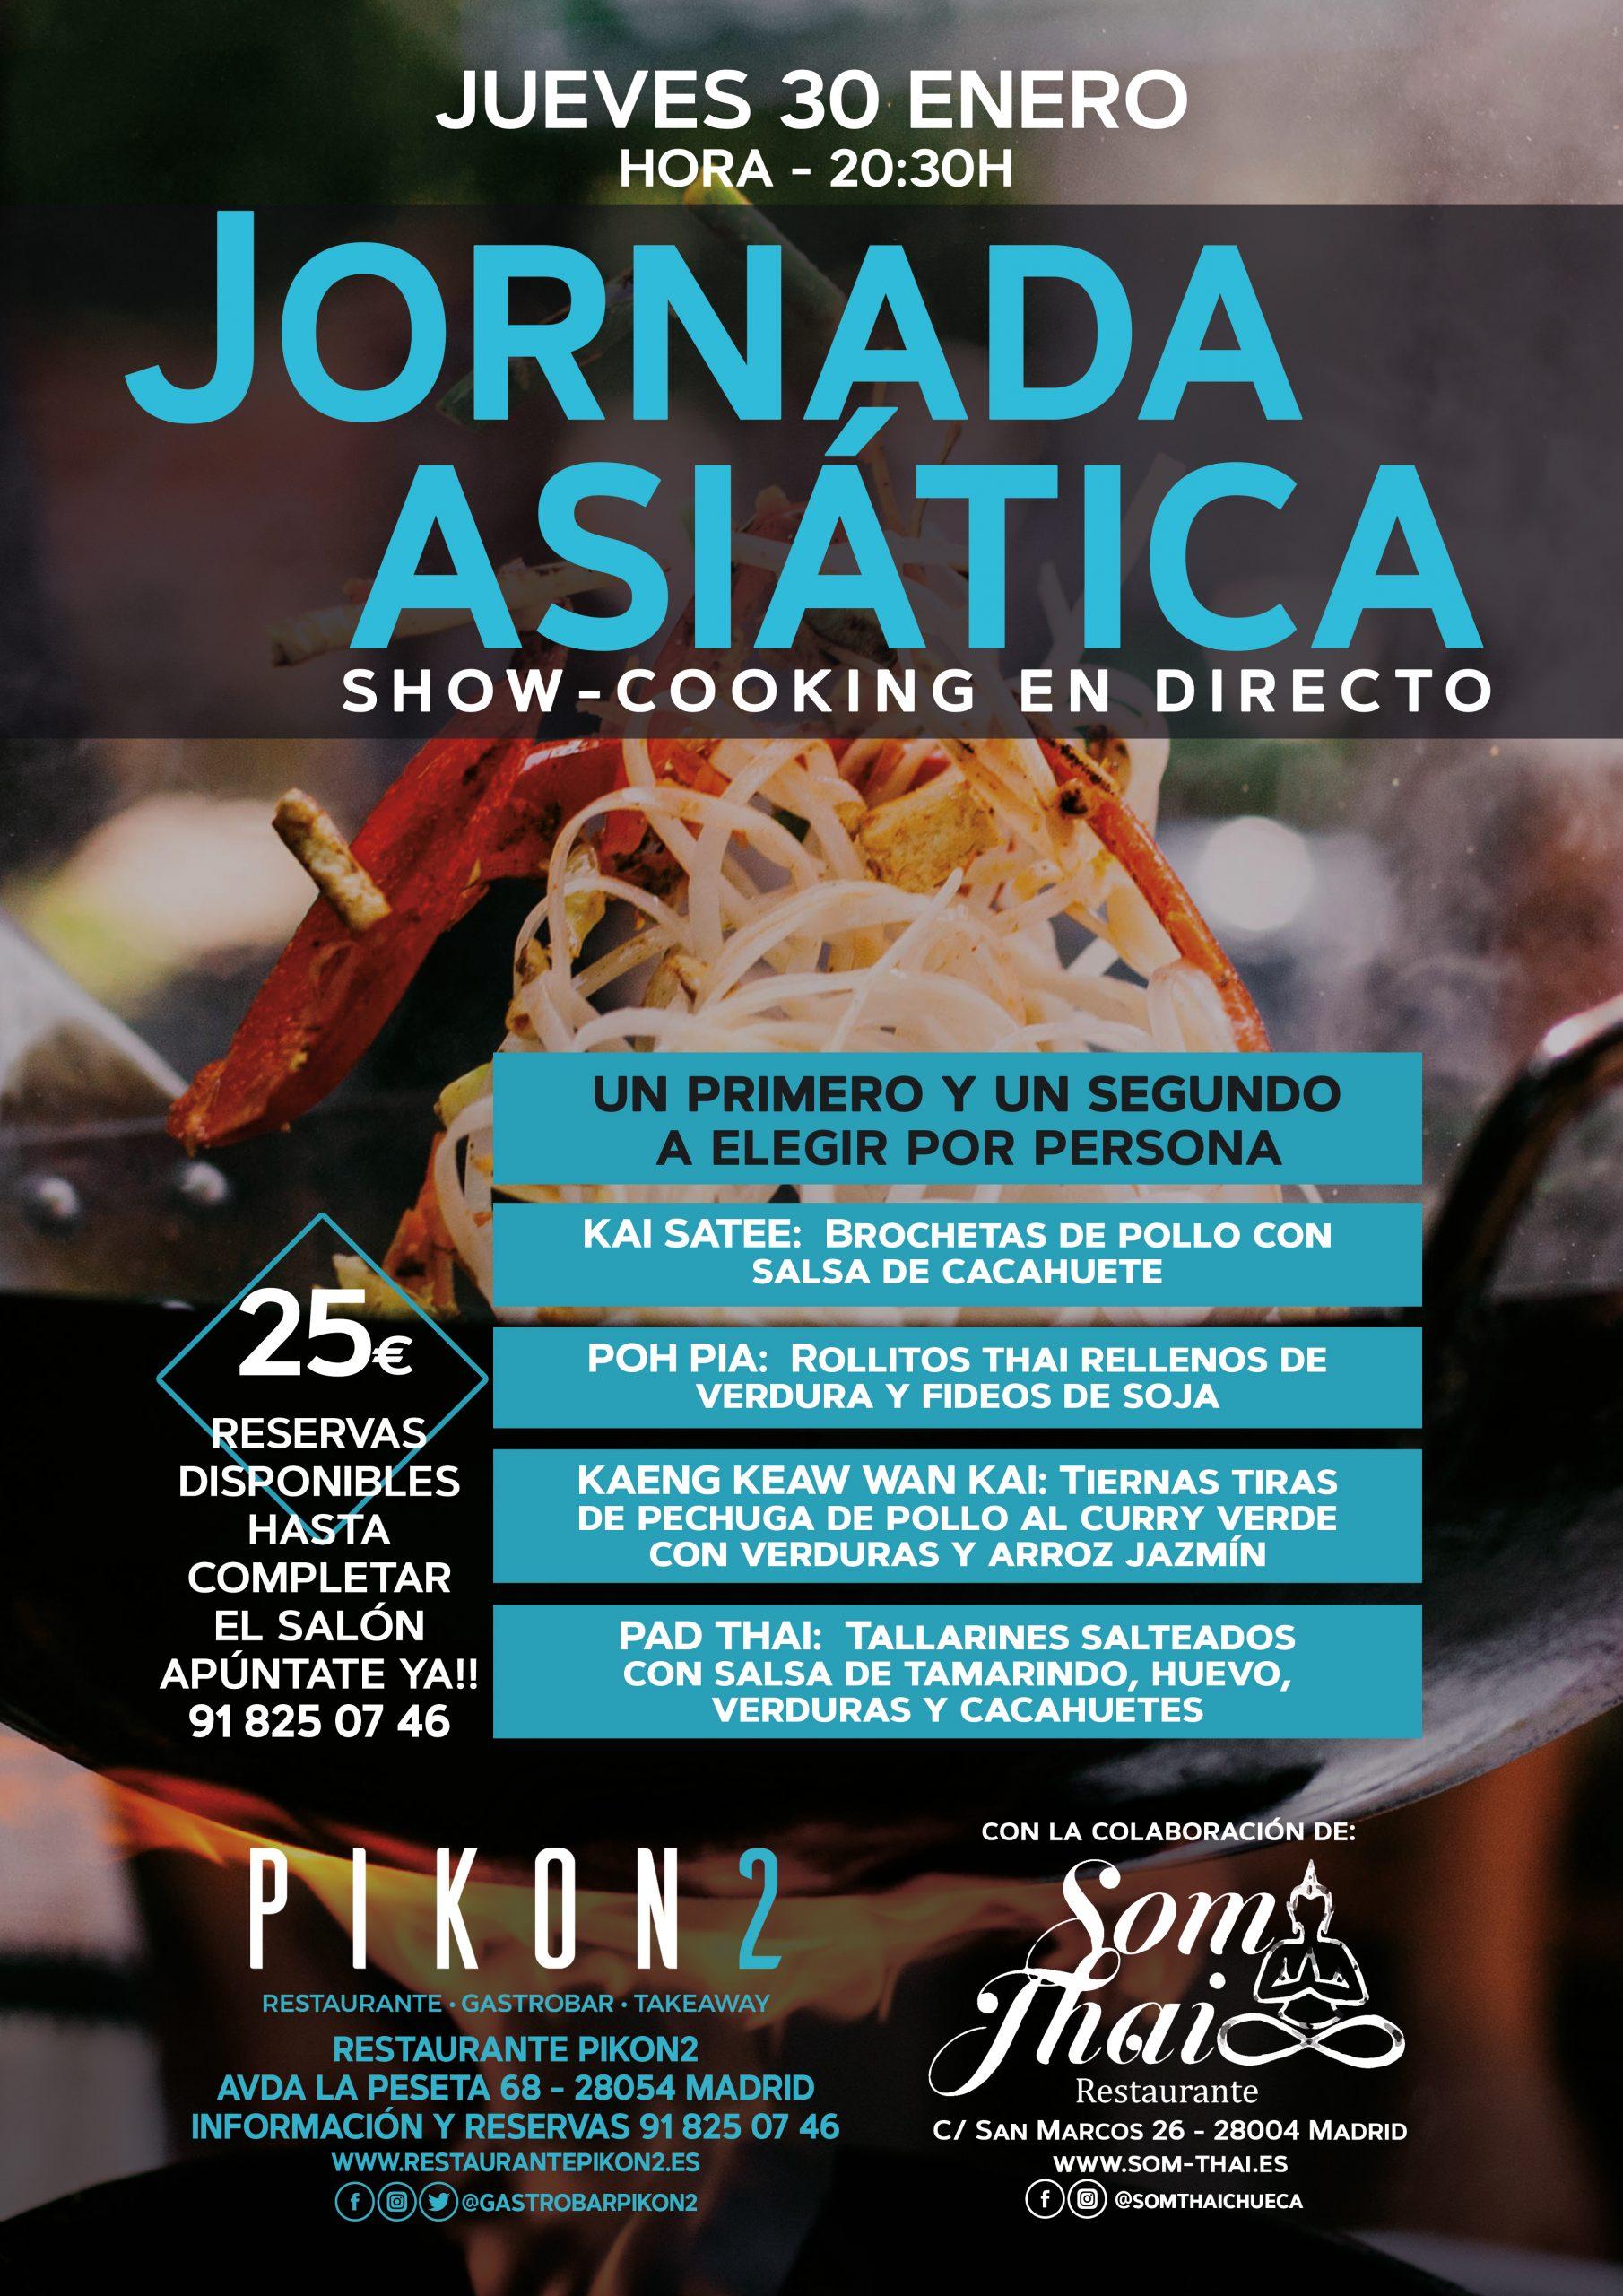 jornada asiática show cooking en restaurante en carabanchel Pikon2 en Madrid